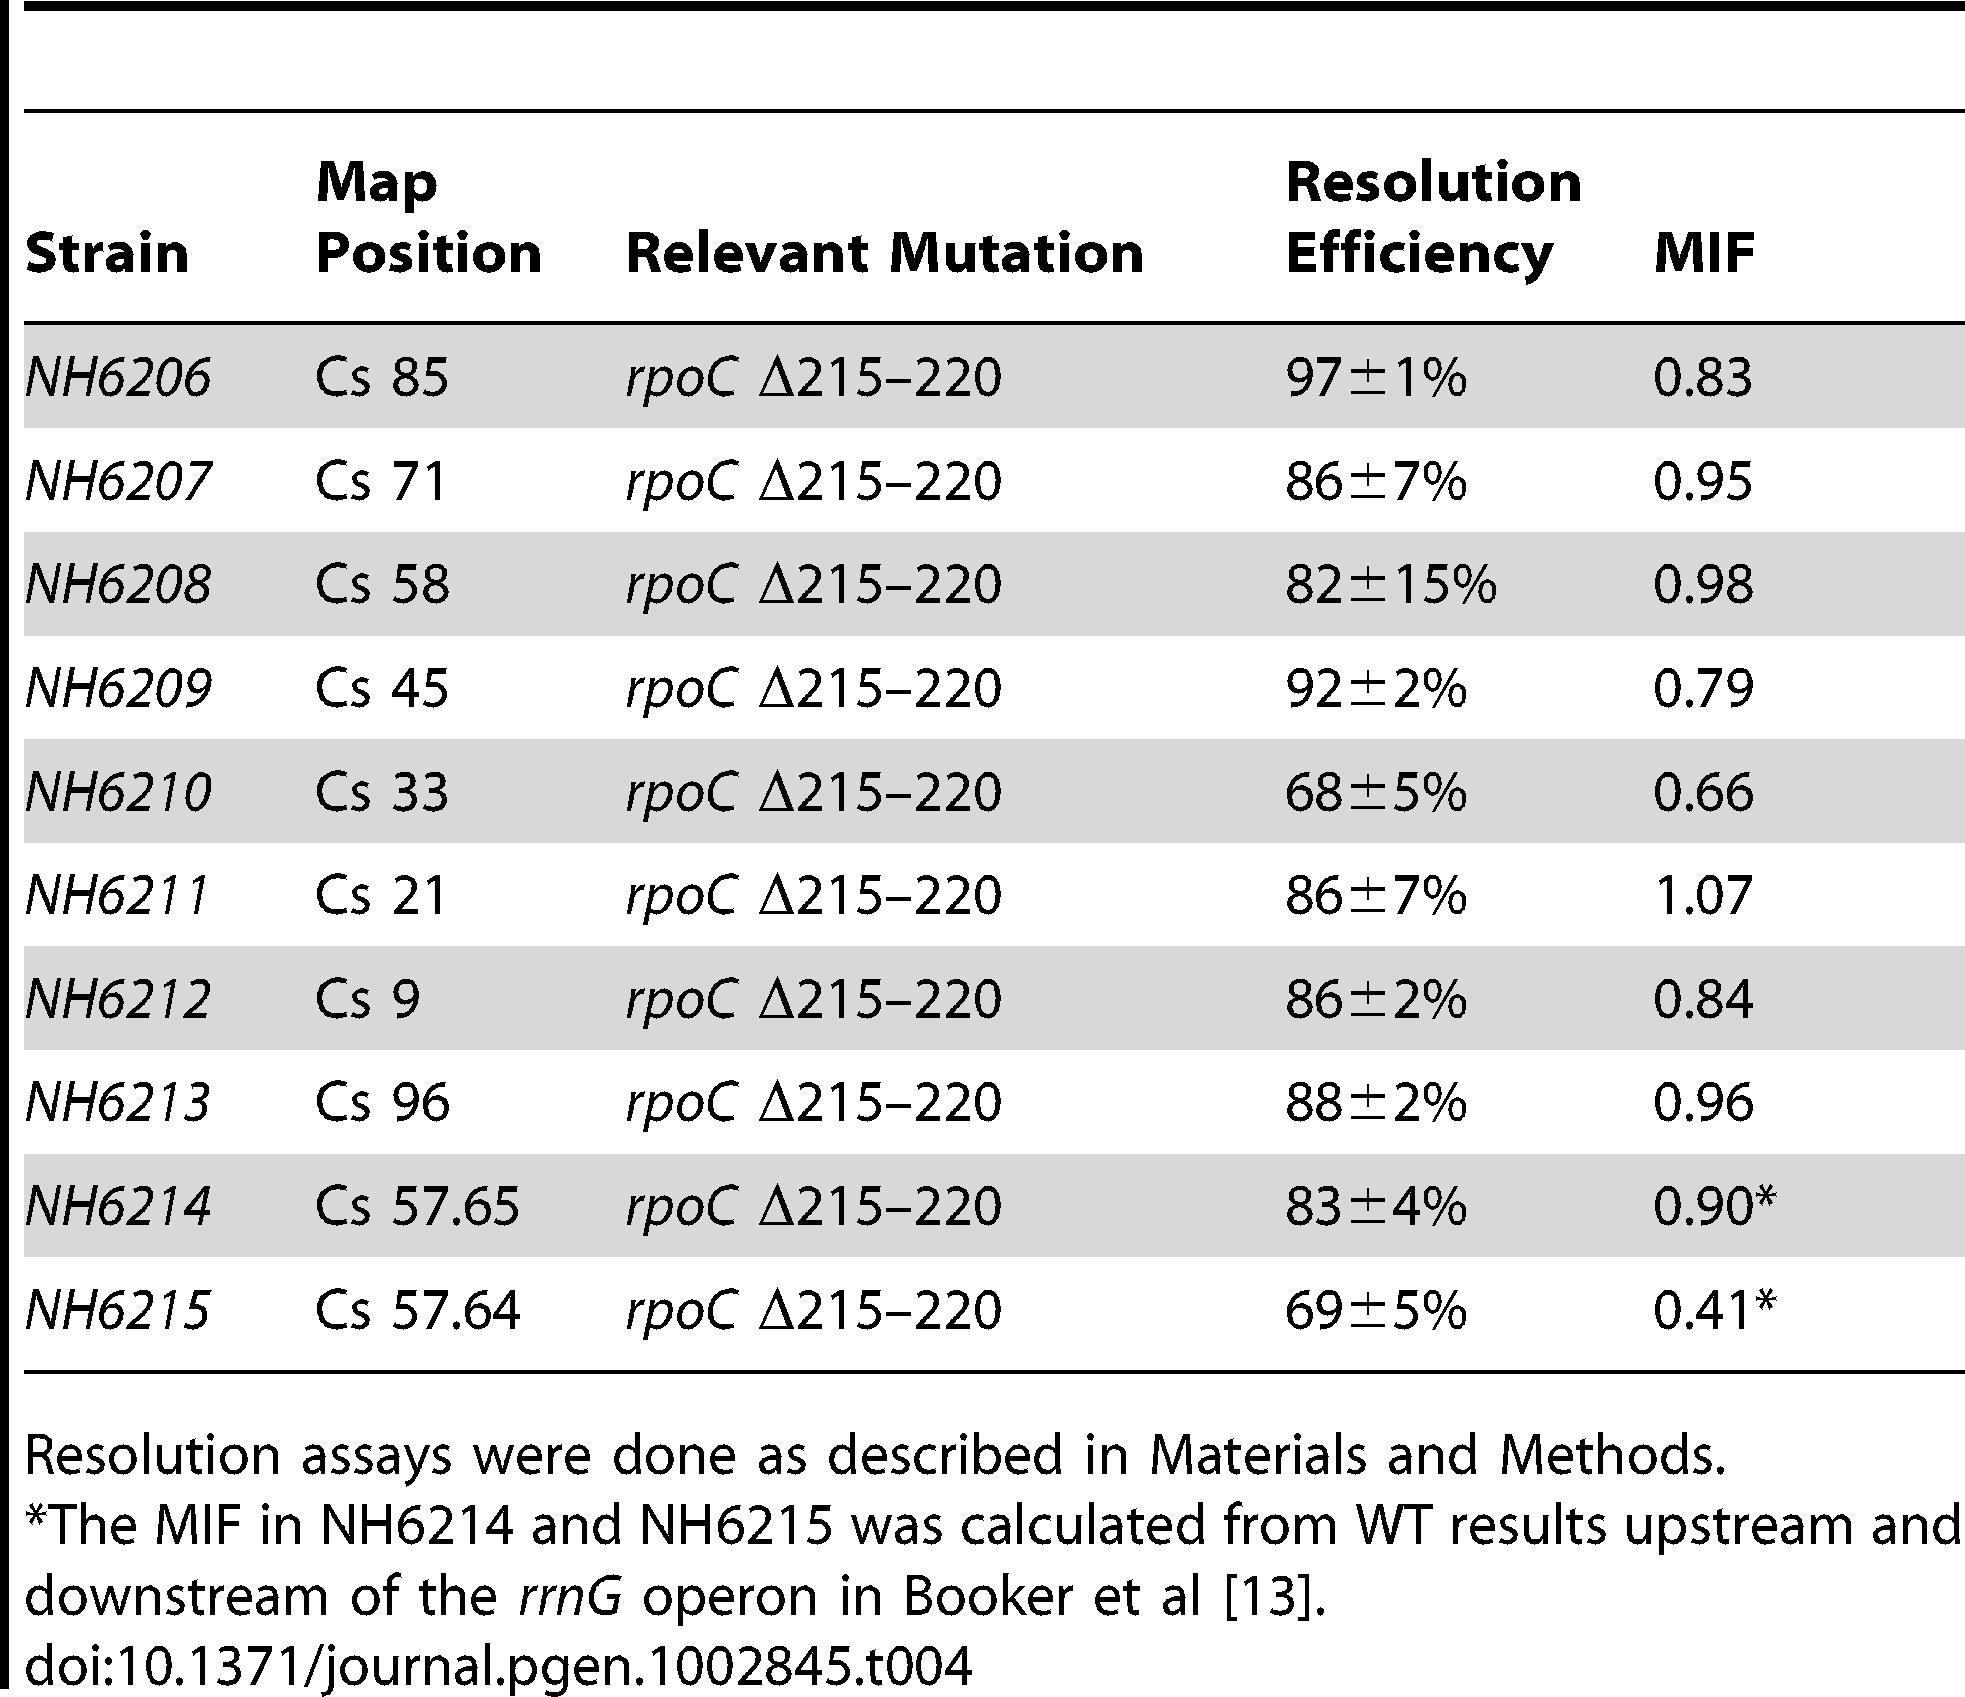 Impact of a 6 amino acid <i>rpoC</i> deletion on <i>Salmonella</i> resolution efficiency.